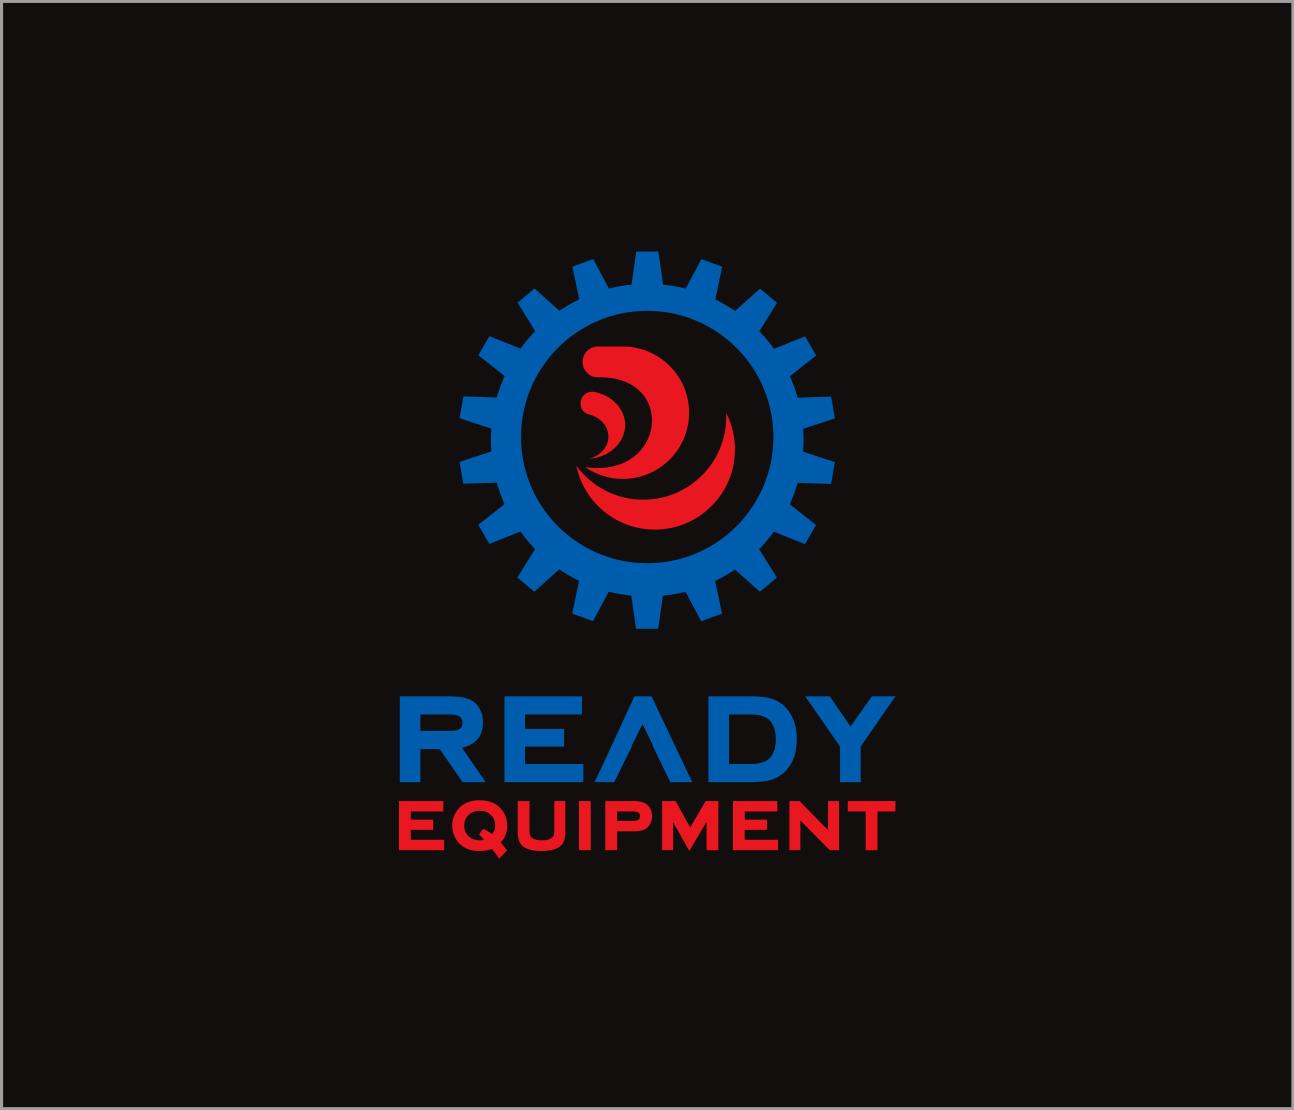 Logo Design by Armada Jamaluddin - Entry No. 91 in the Logo Design Contest Ready Equipment  Logo Design.